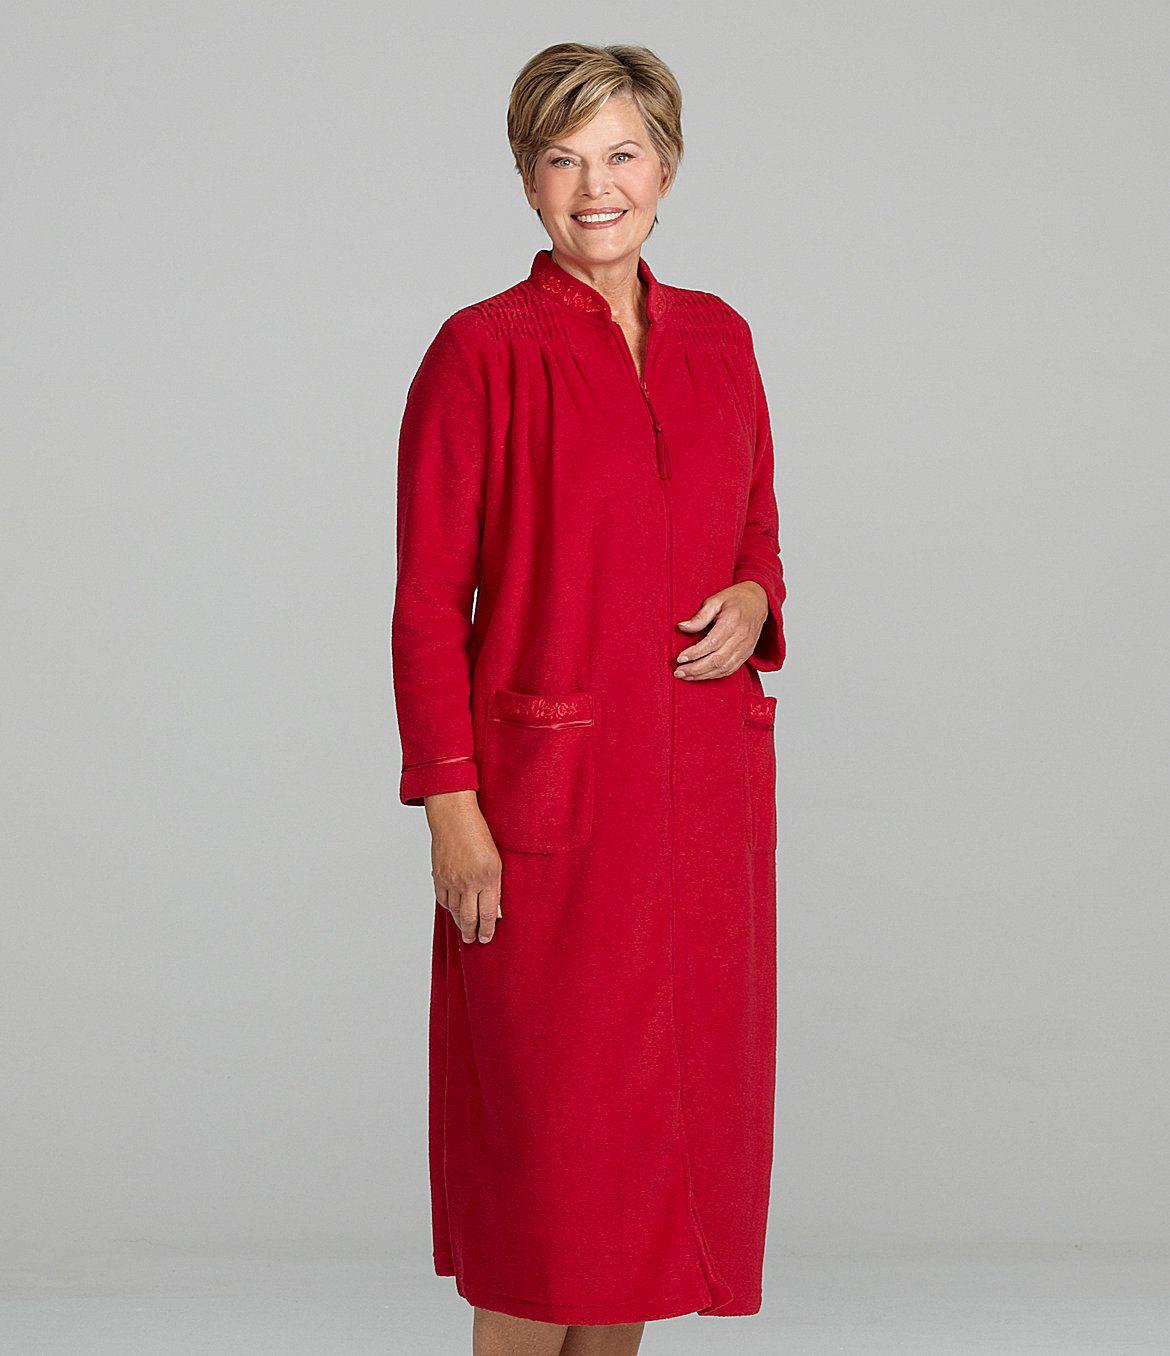 Petite 2x robes